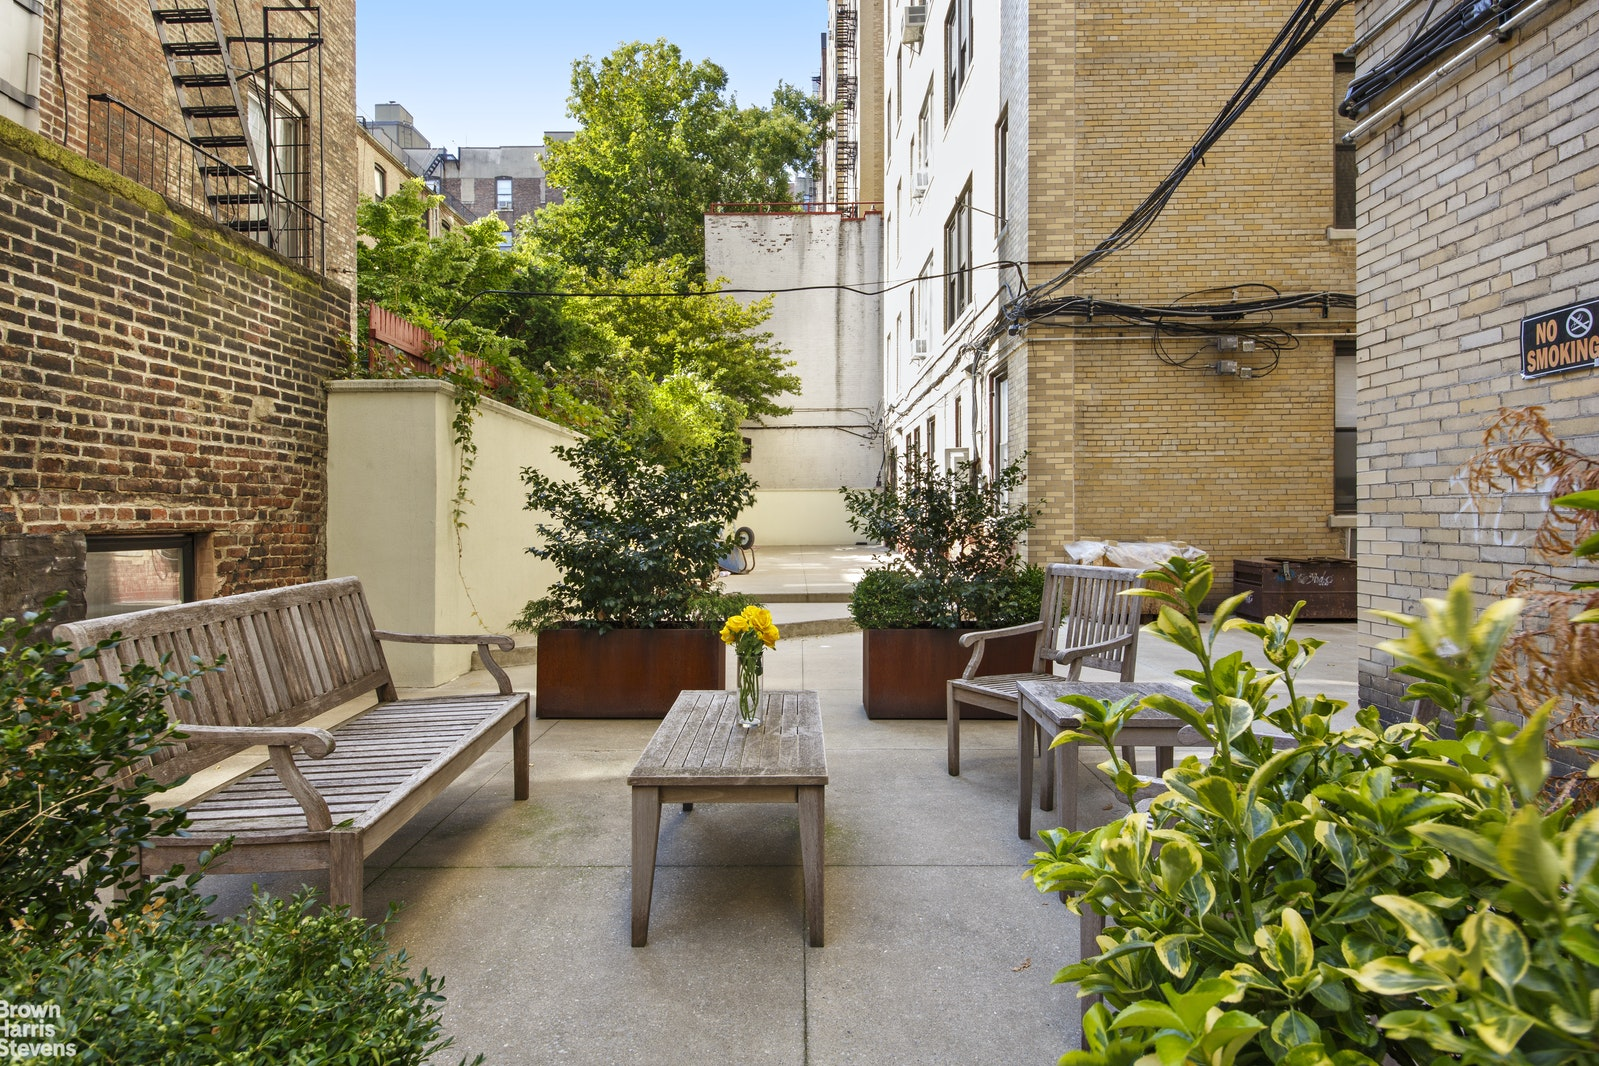 310 WEST 86TH STREET 3B, Upper West Side, $3,150,000, Web #: 20378245